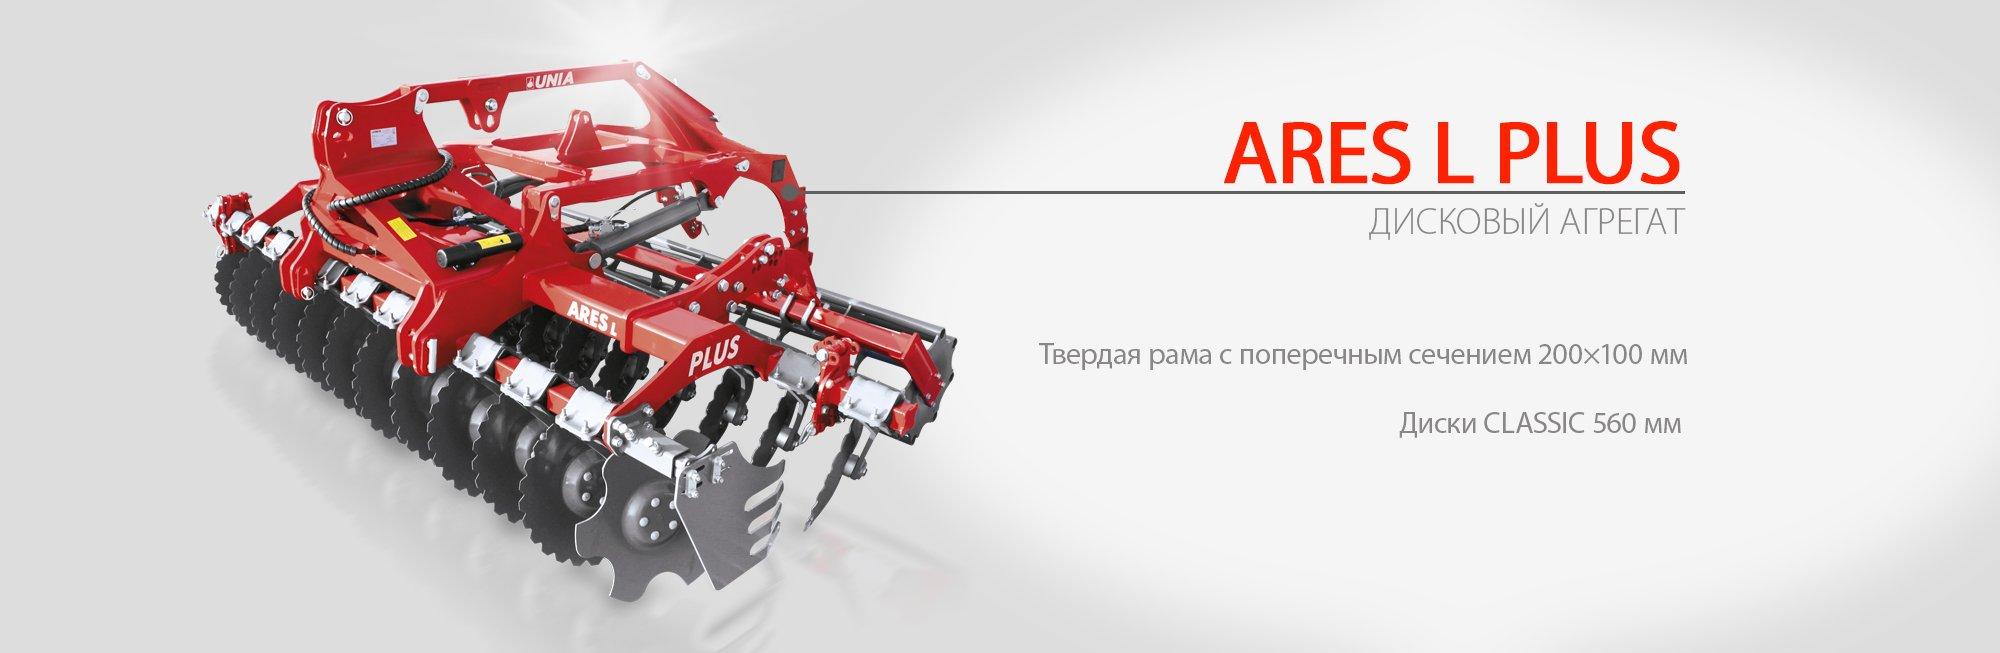 UNIA_rotator_ARES_L_PLUS_RU_slide_01